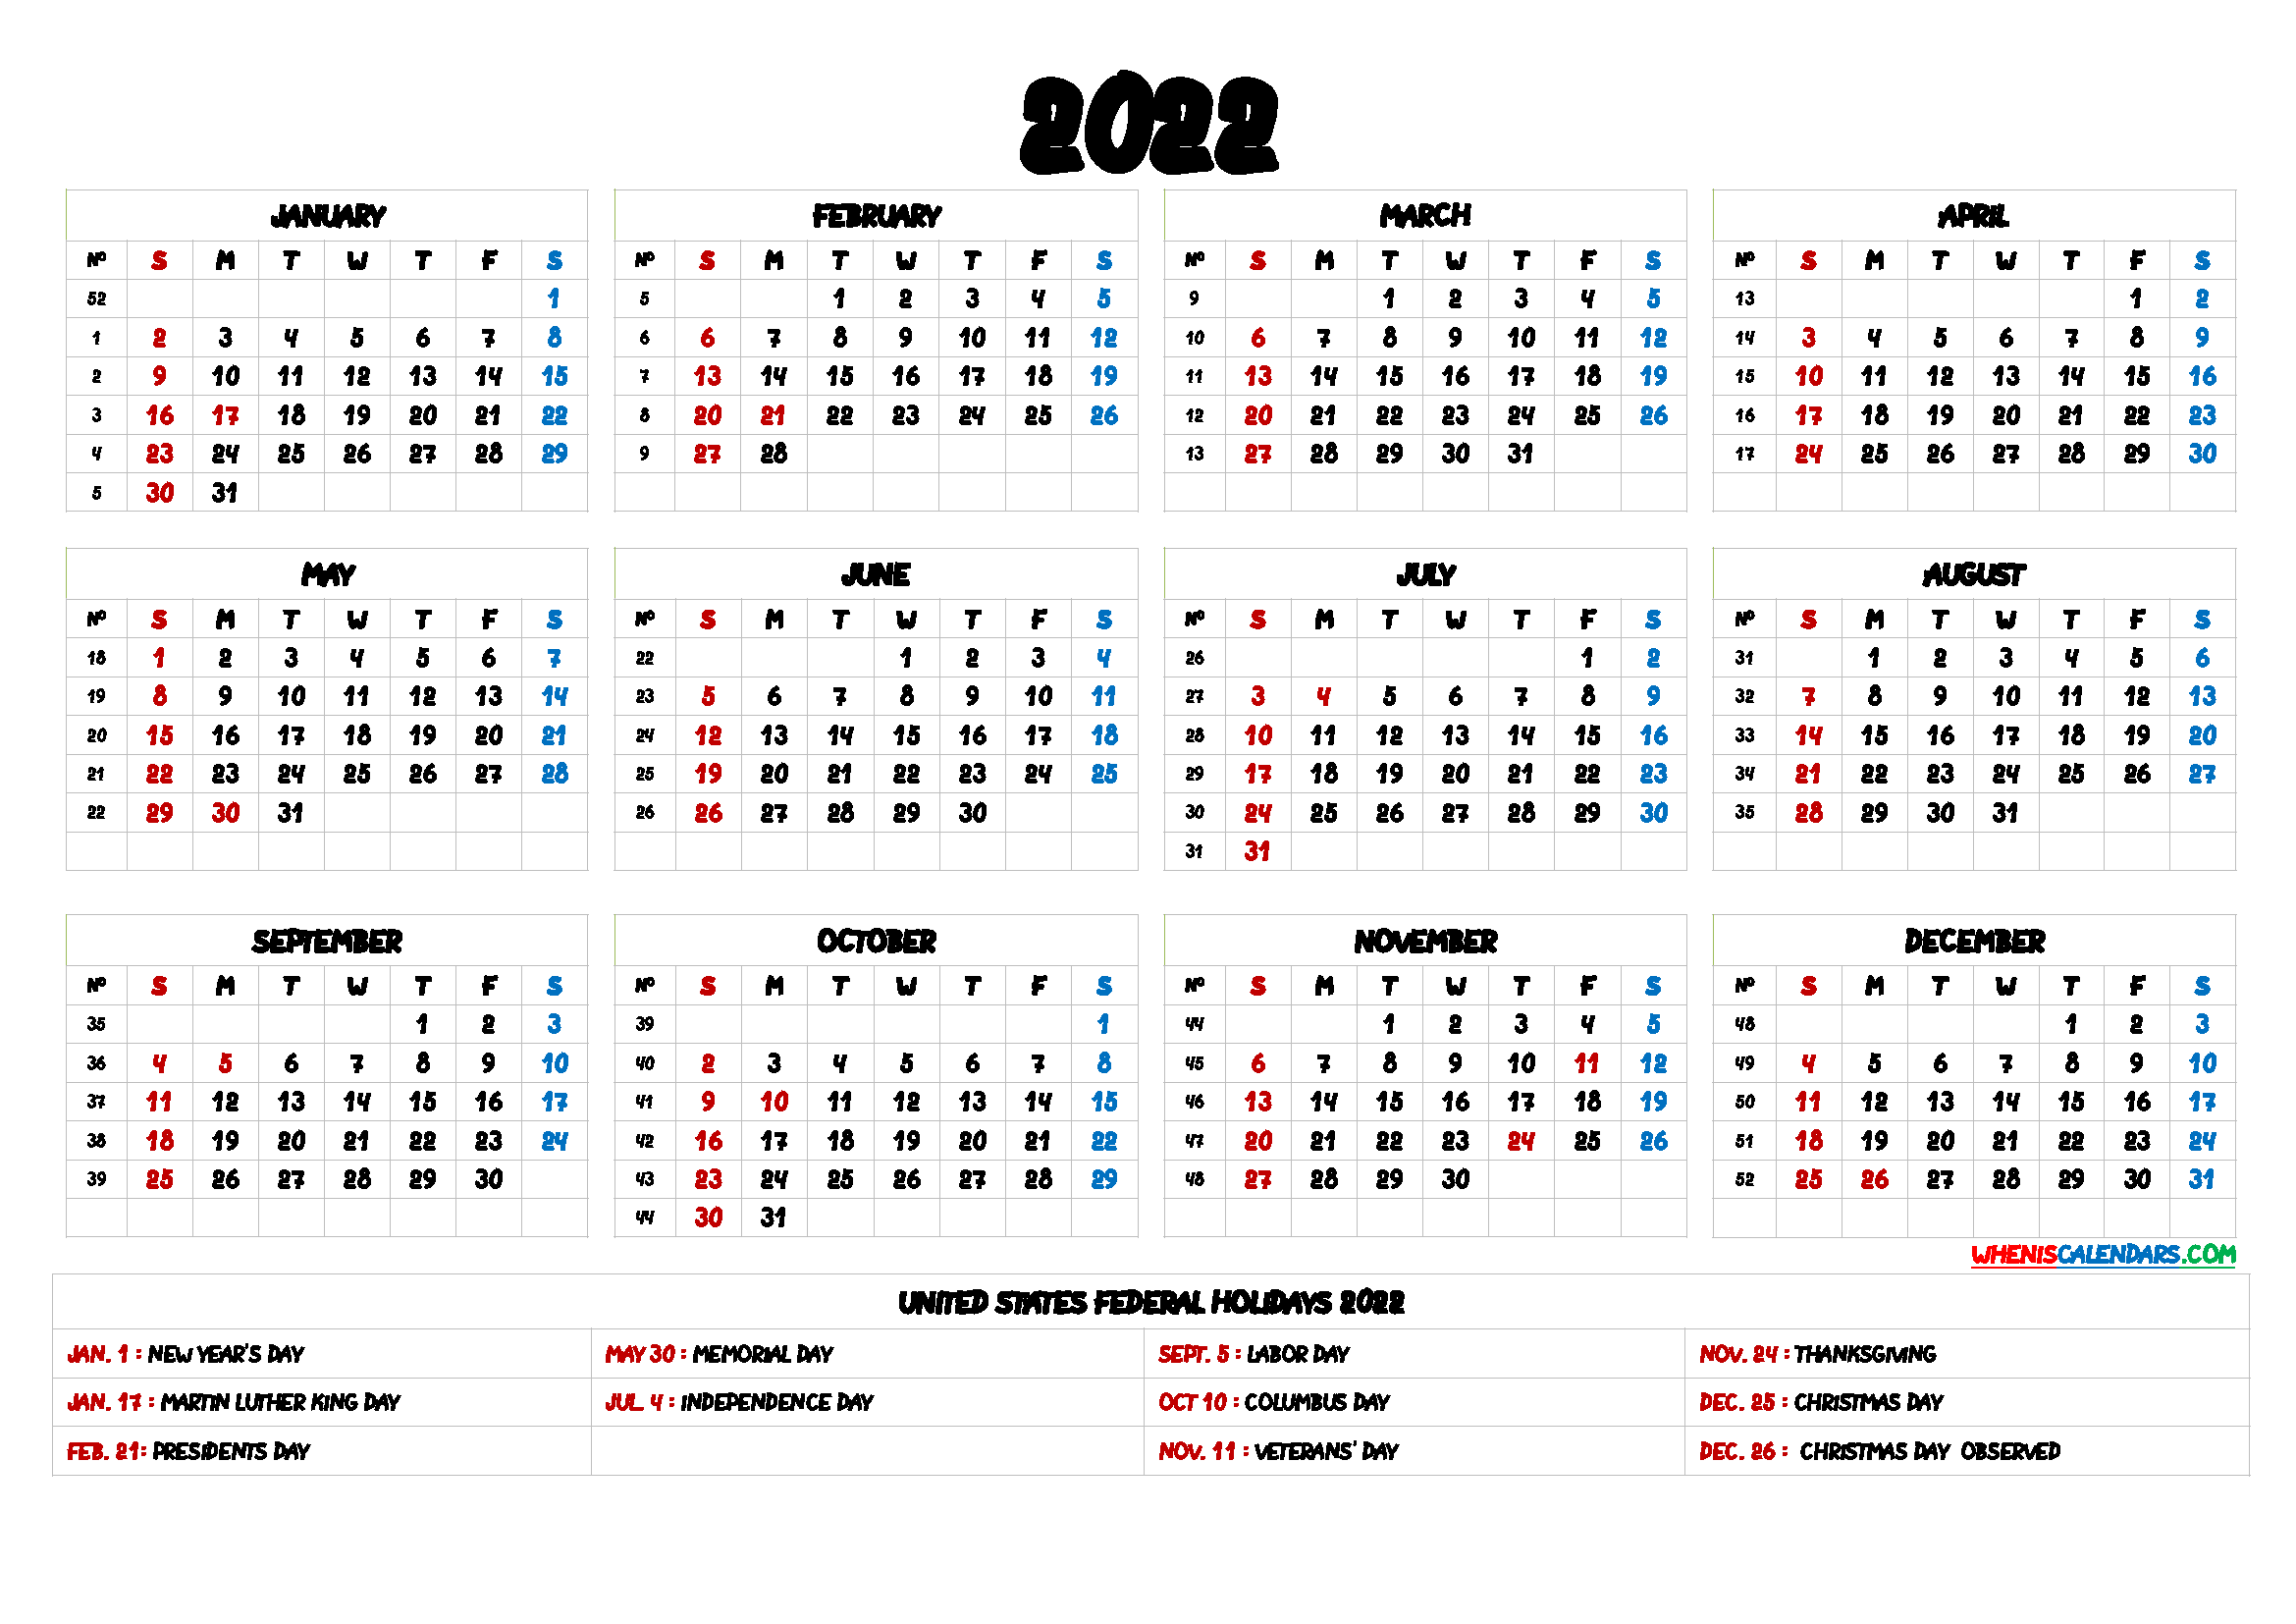 Free Printable 2022 Calendar with Holidays US